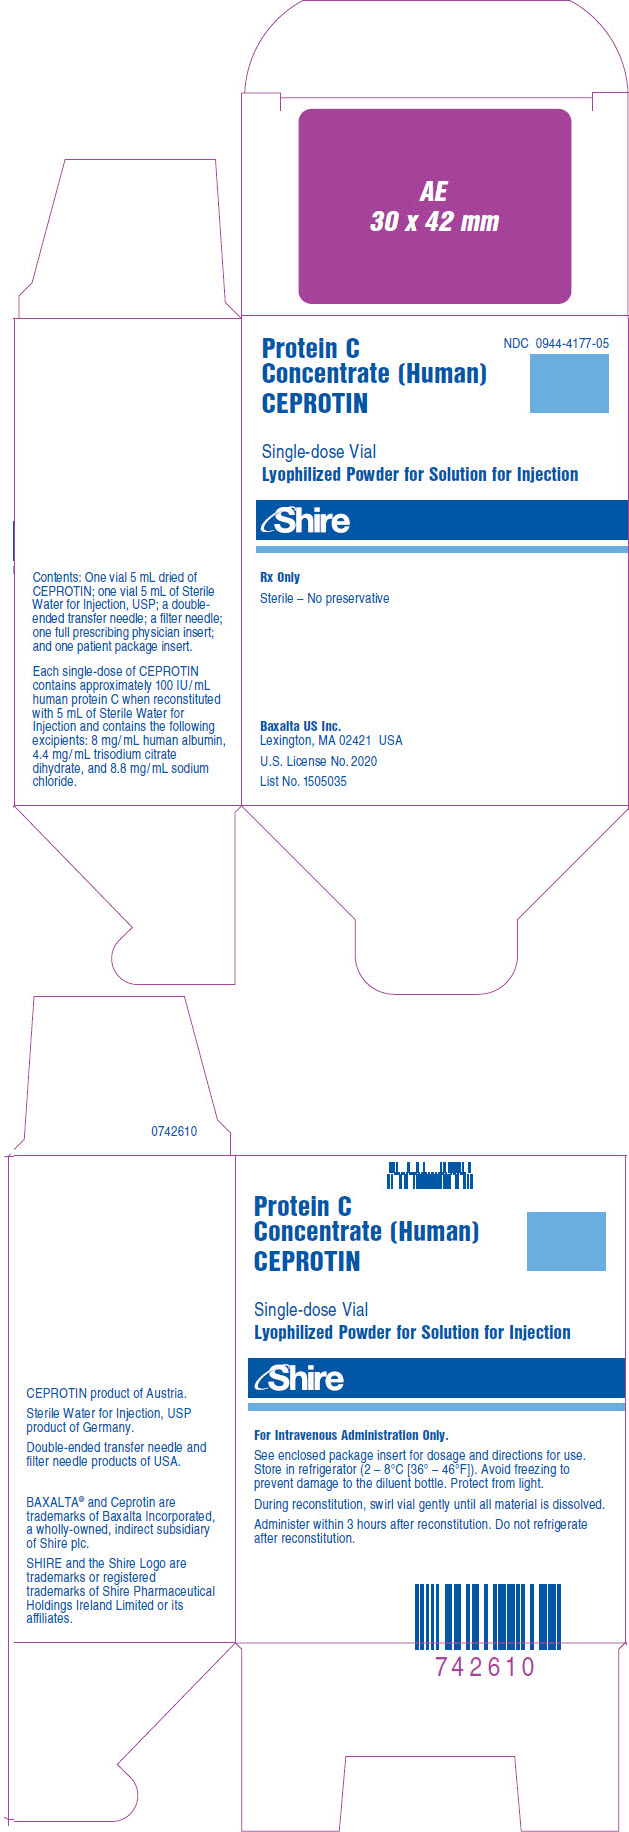 PRINCIPAL DISPLAY PANEL - Kit Carton - NDC: <a href=/NDC/0944-4177-05>0944-4177-05</a>